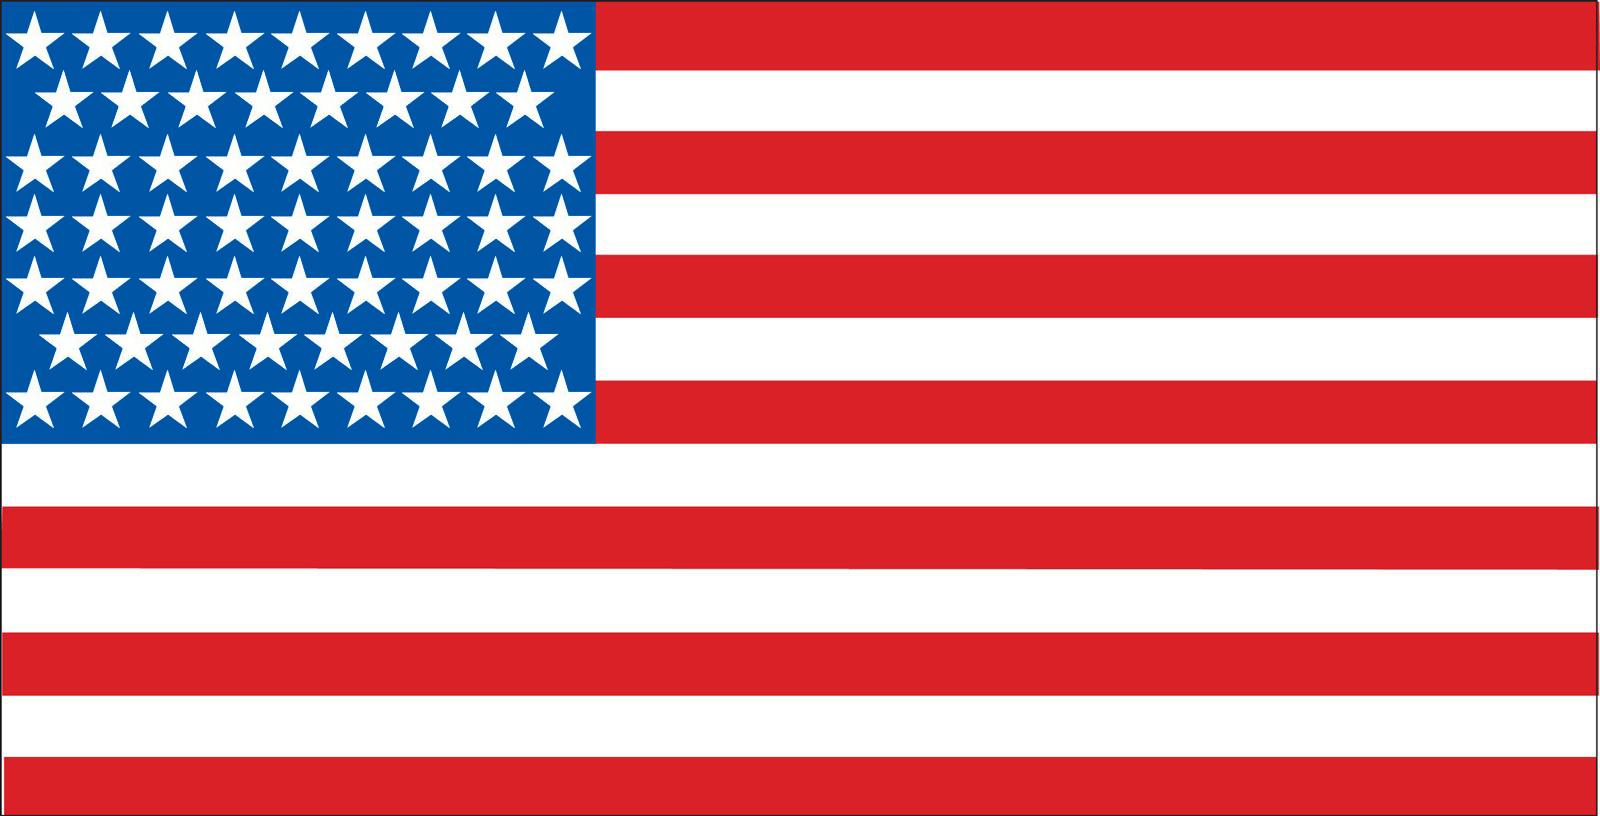 american flag - photo #3